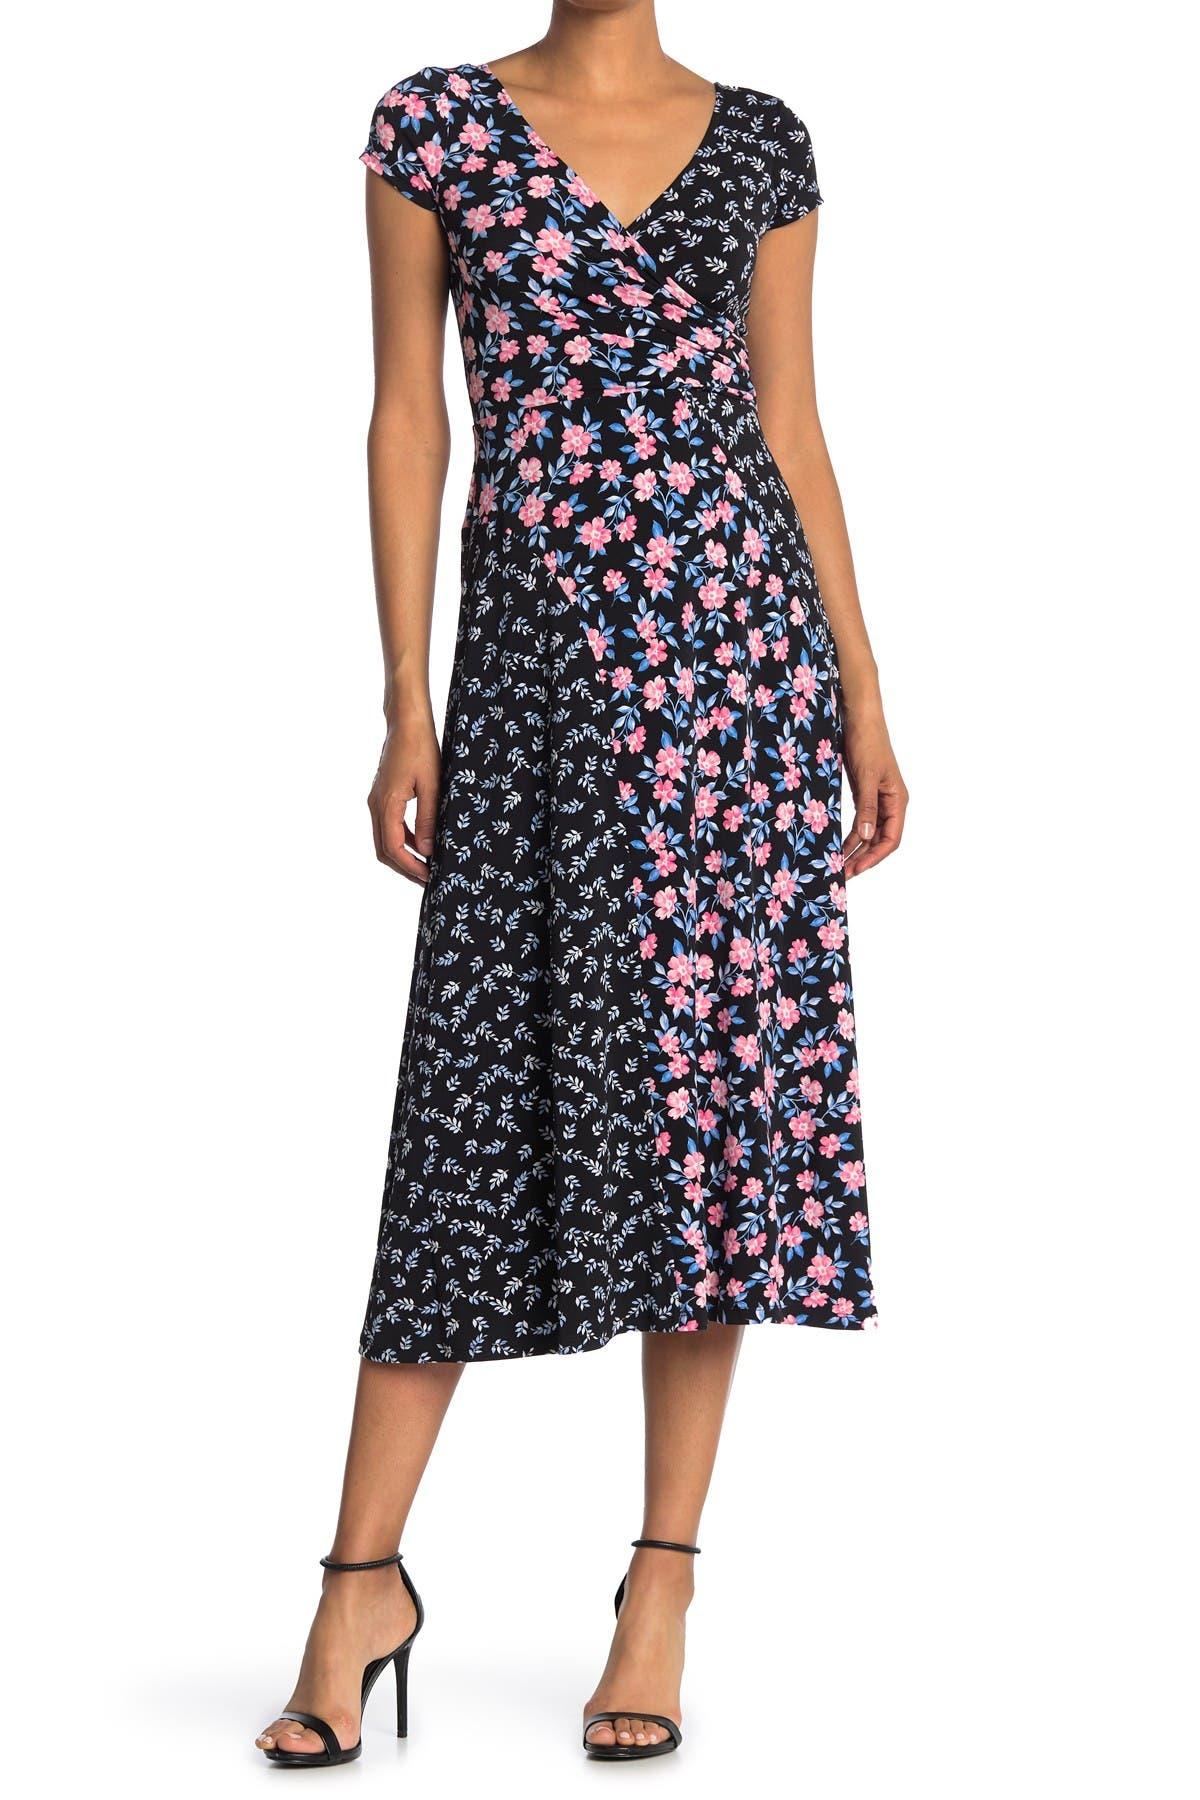 Image of Maggy London Mixed Print Midi Dress